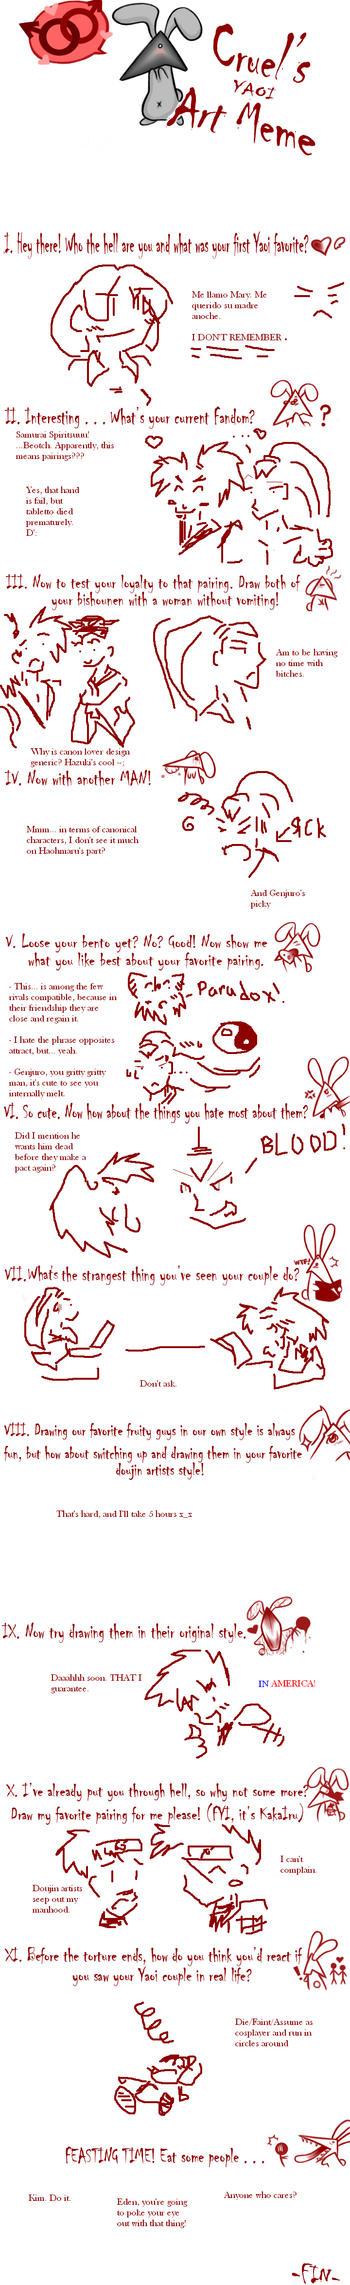 Yaoi Art Meme by GringoLee